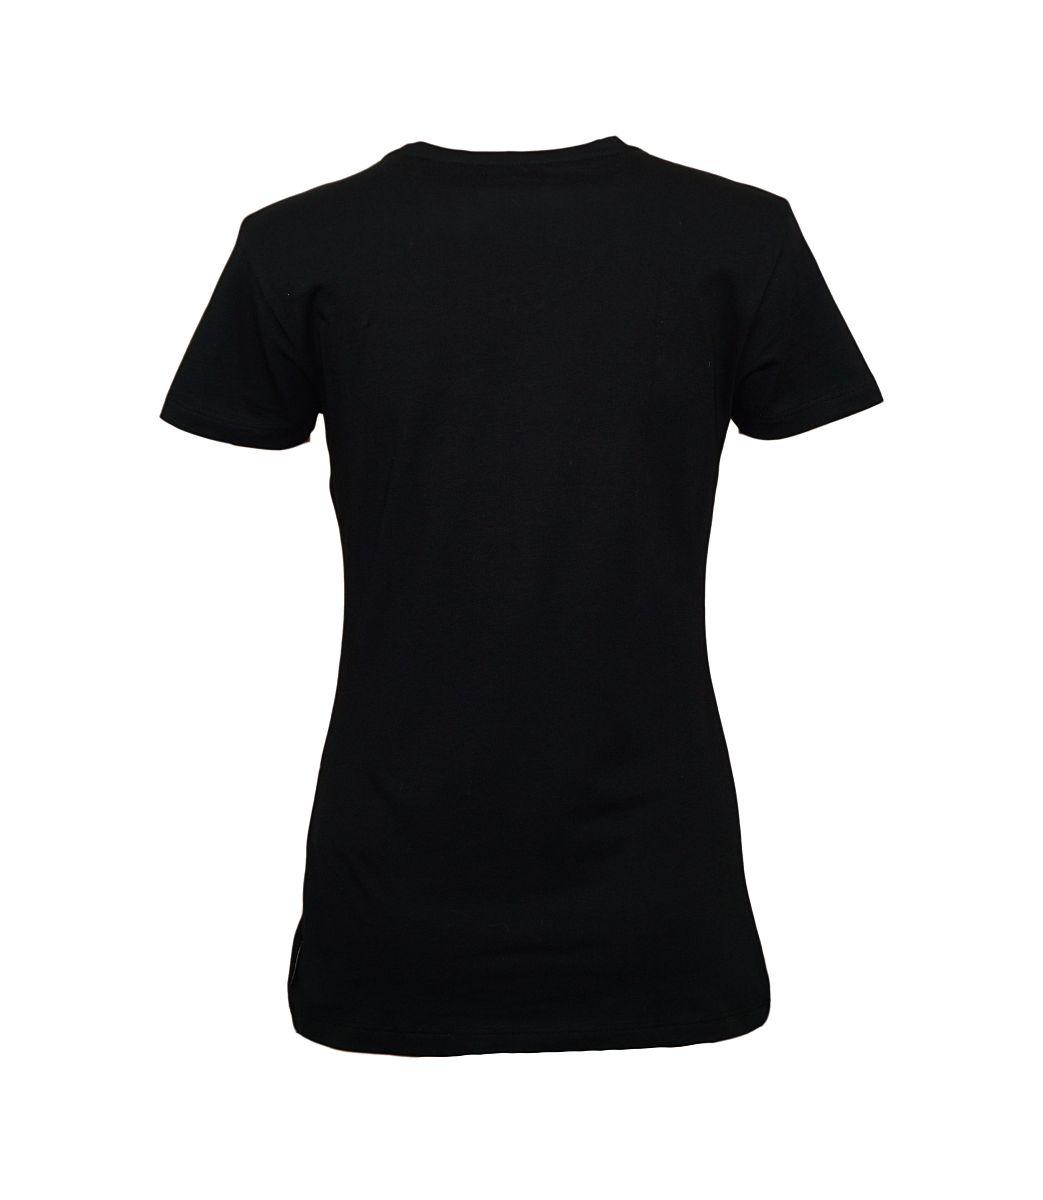 Emporio Armani Damen T-Shirt V-Ausschnitt 163321 7A263 00020 NERO HW17-EADS1